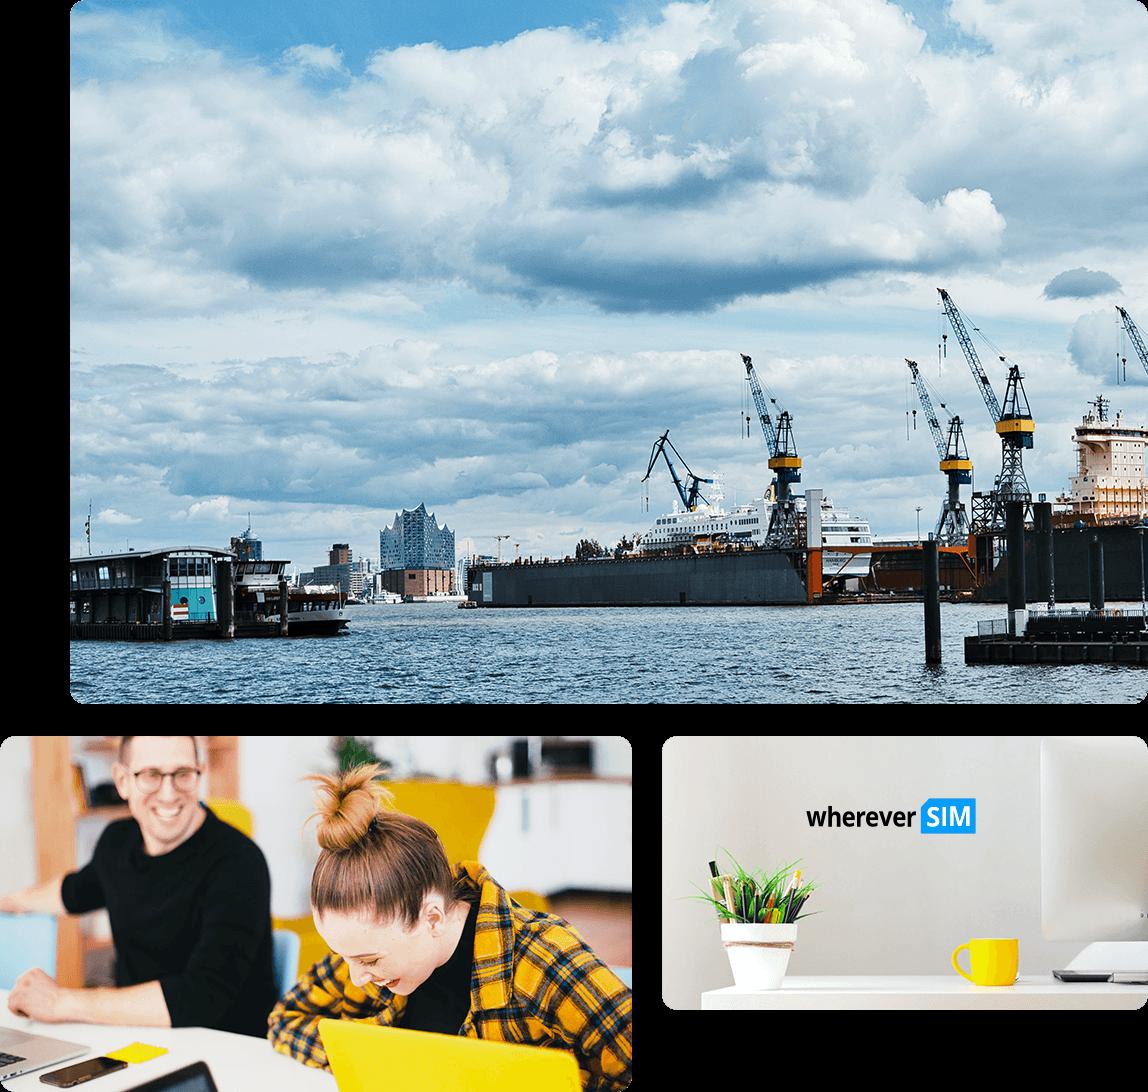 Unternehmen - wherever SIM